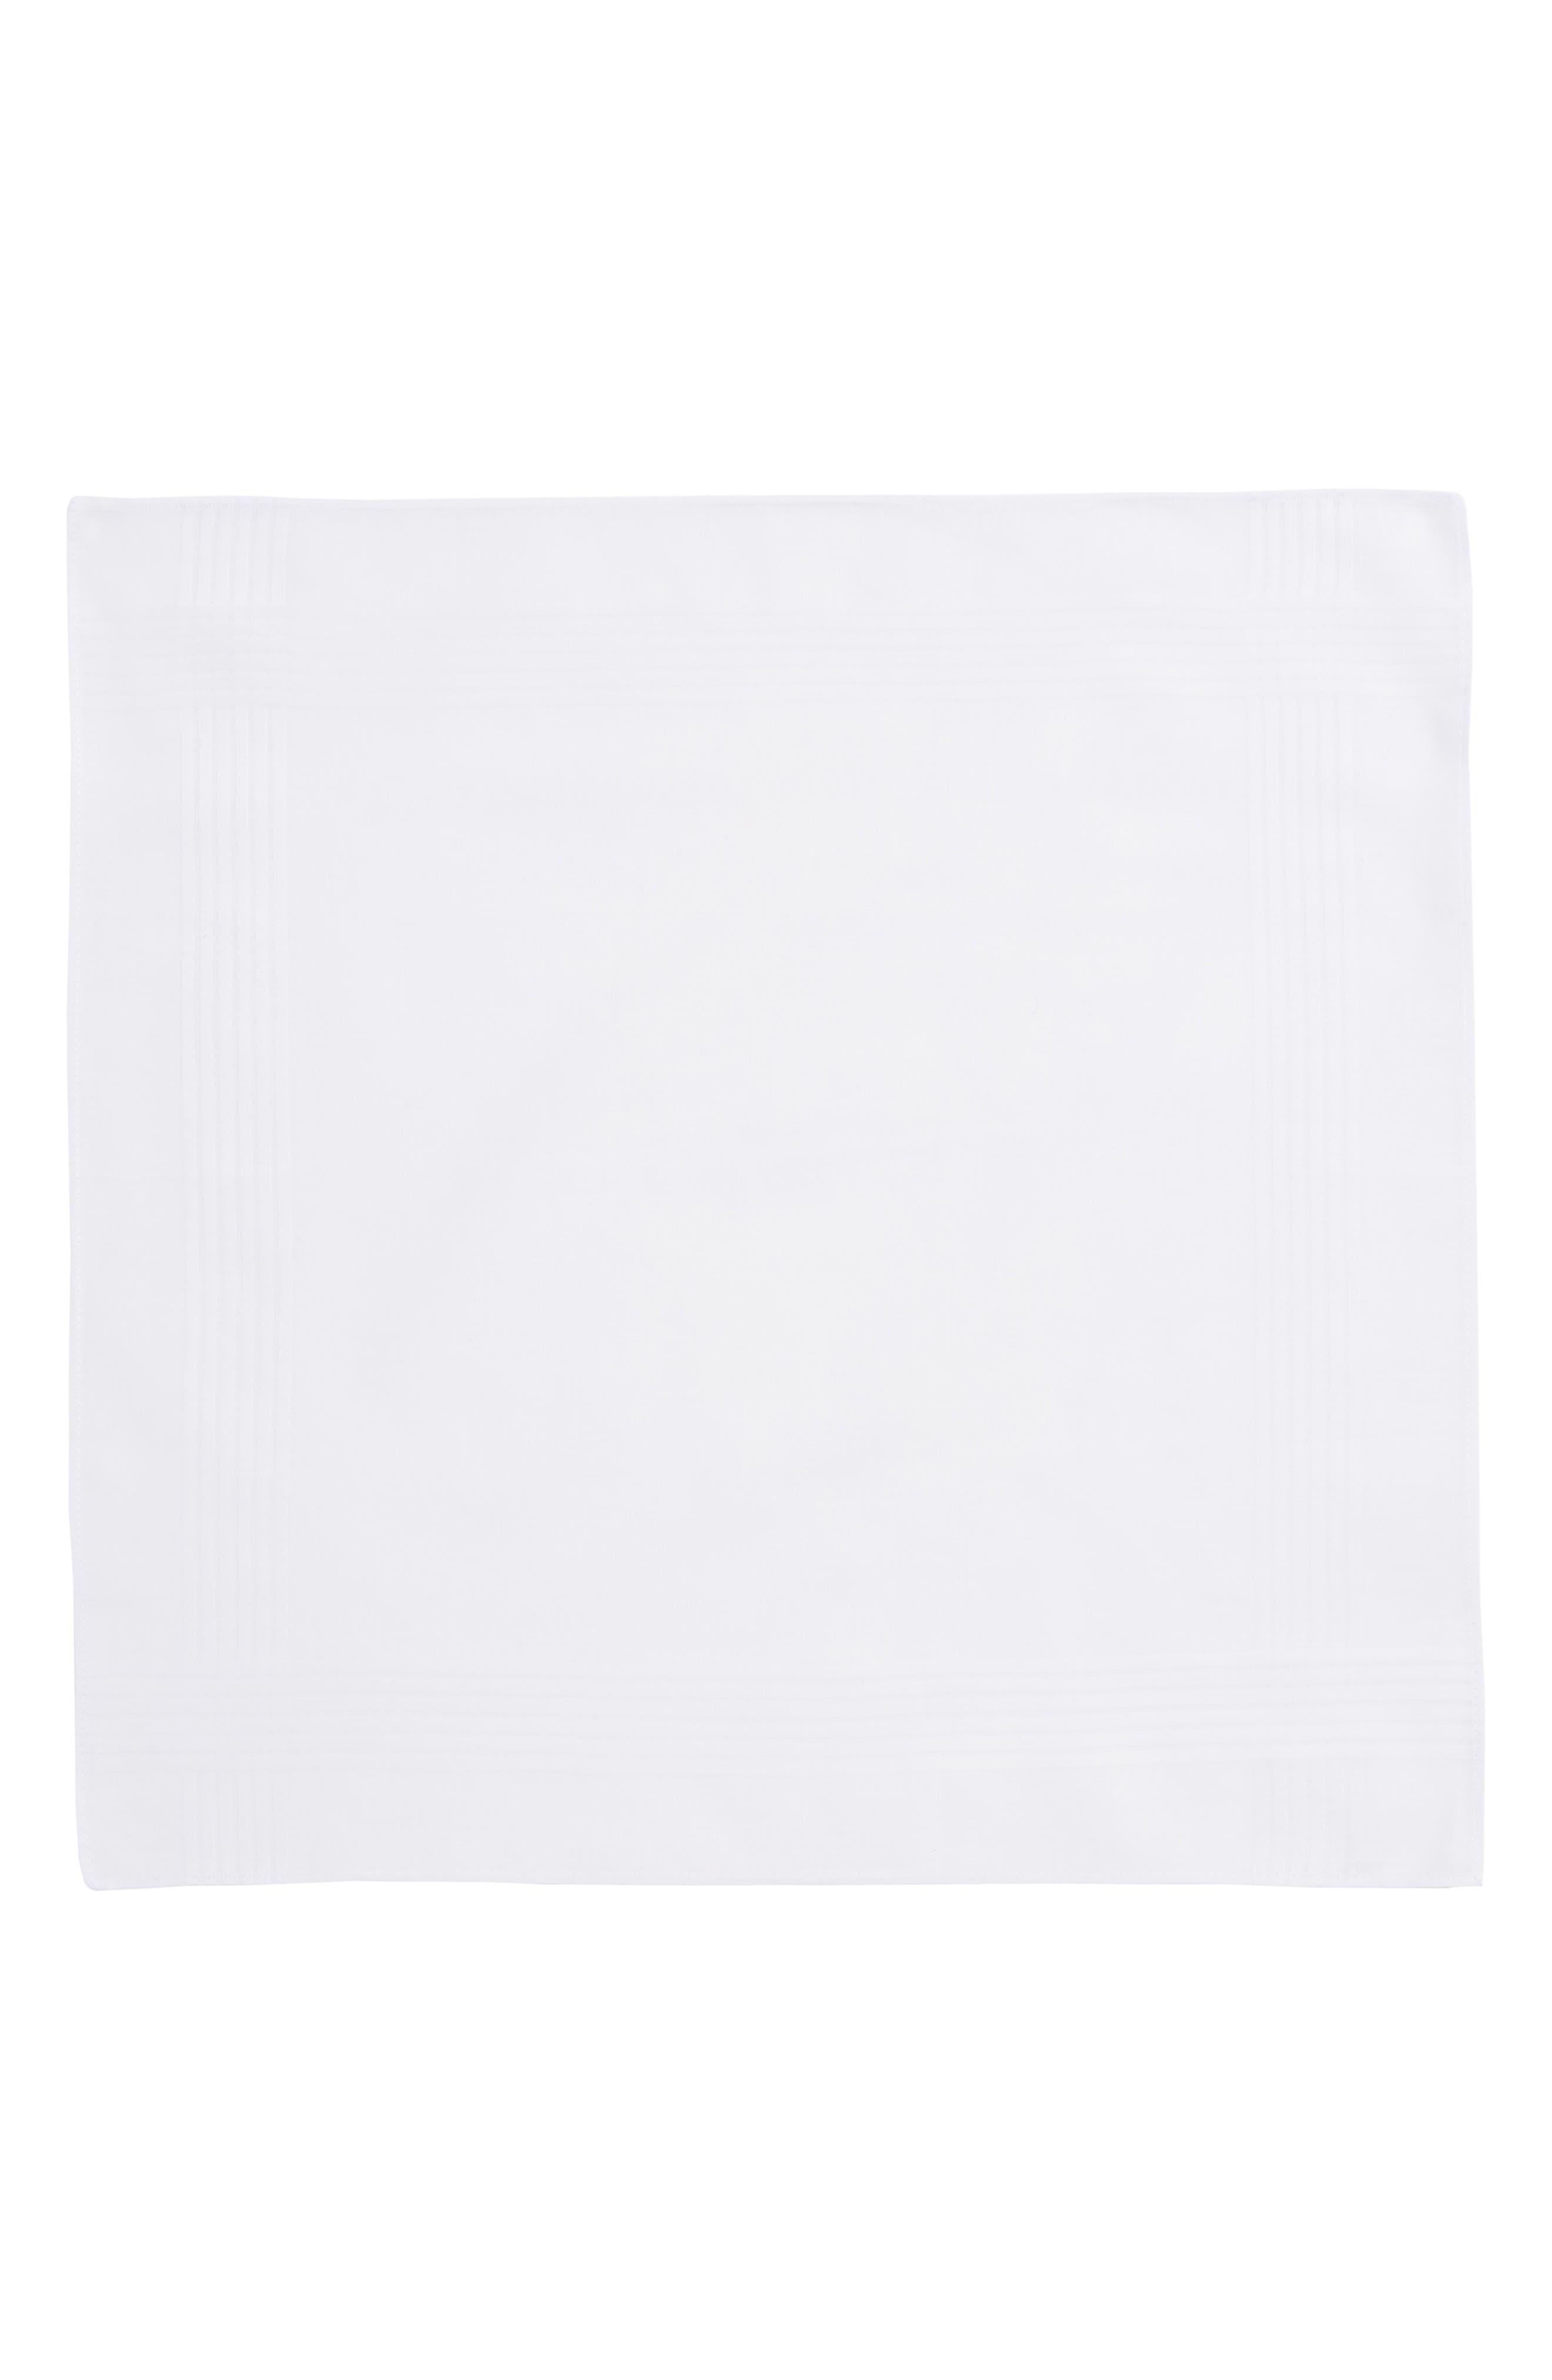 NORDSTROM MEN'S SHOP, 13-Pack Handkerchiefs, Alternate thumbnail 2, color, ASSORTED